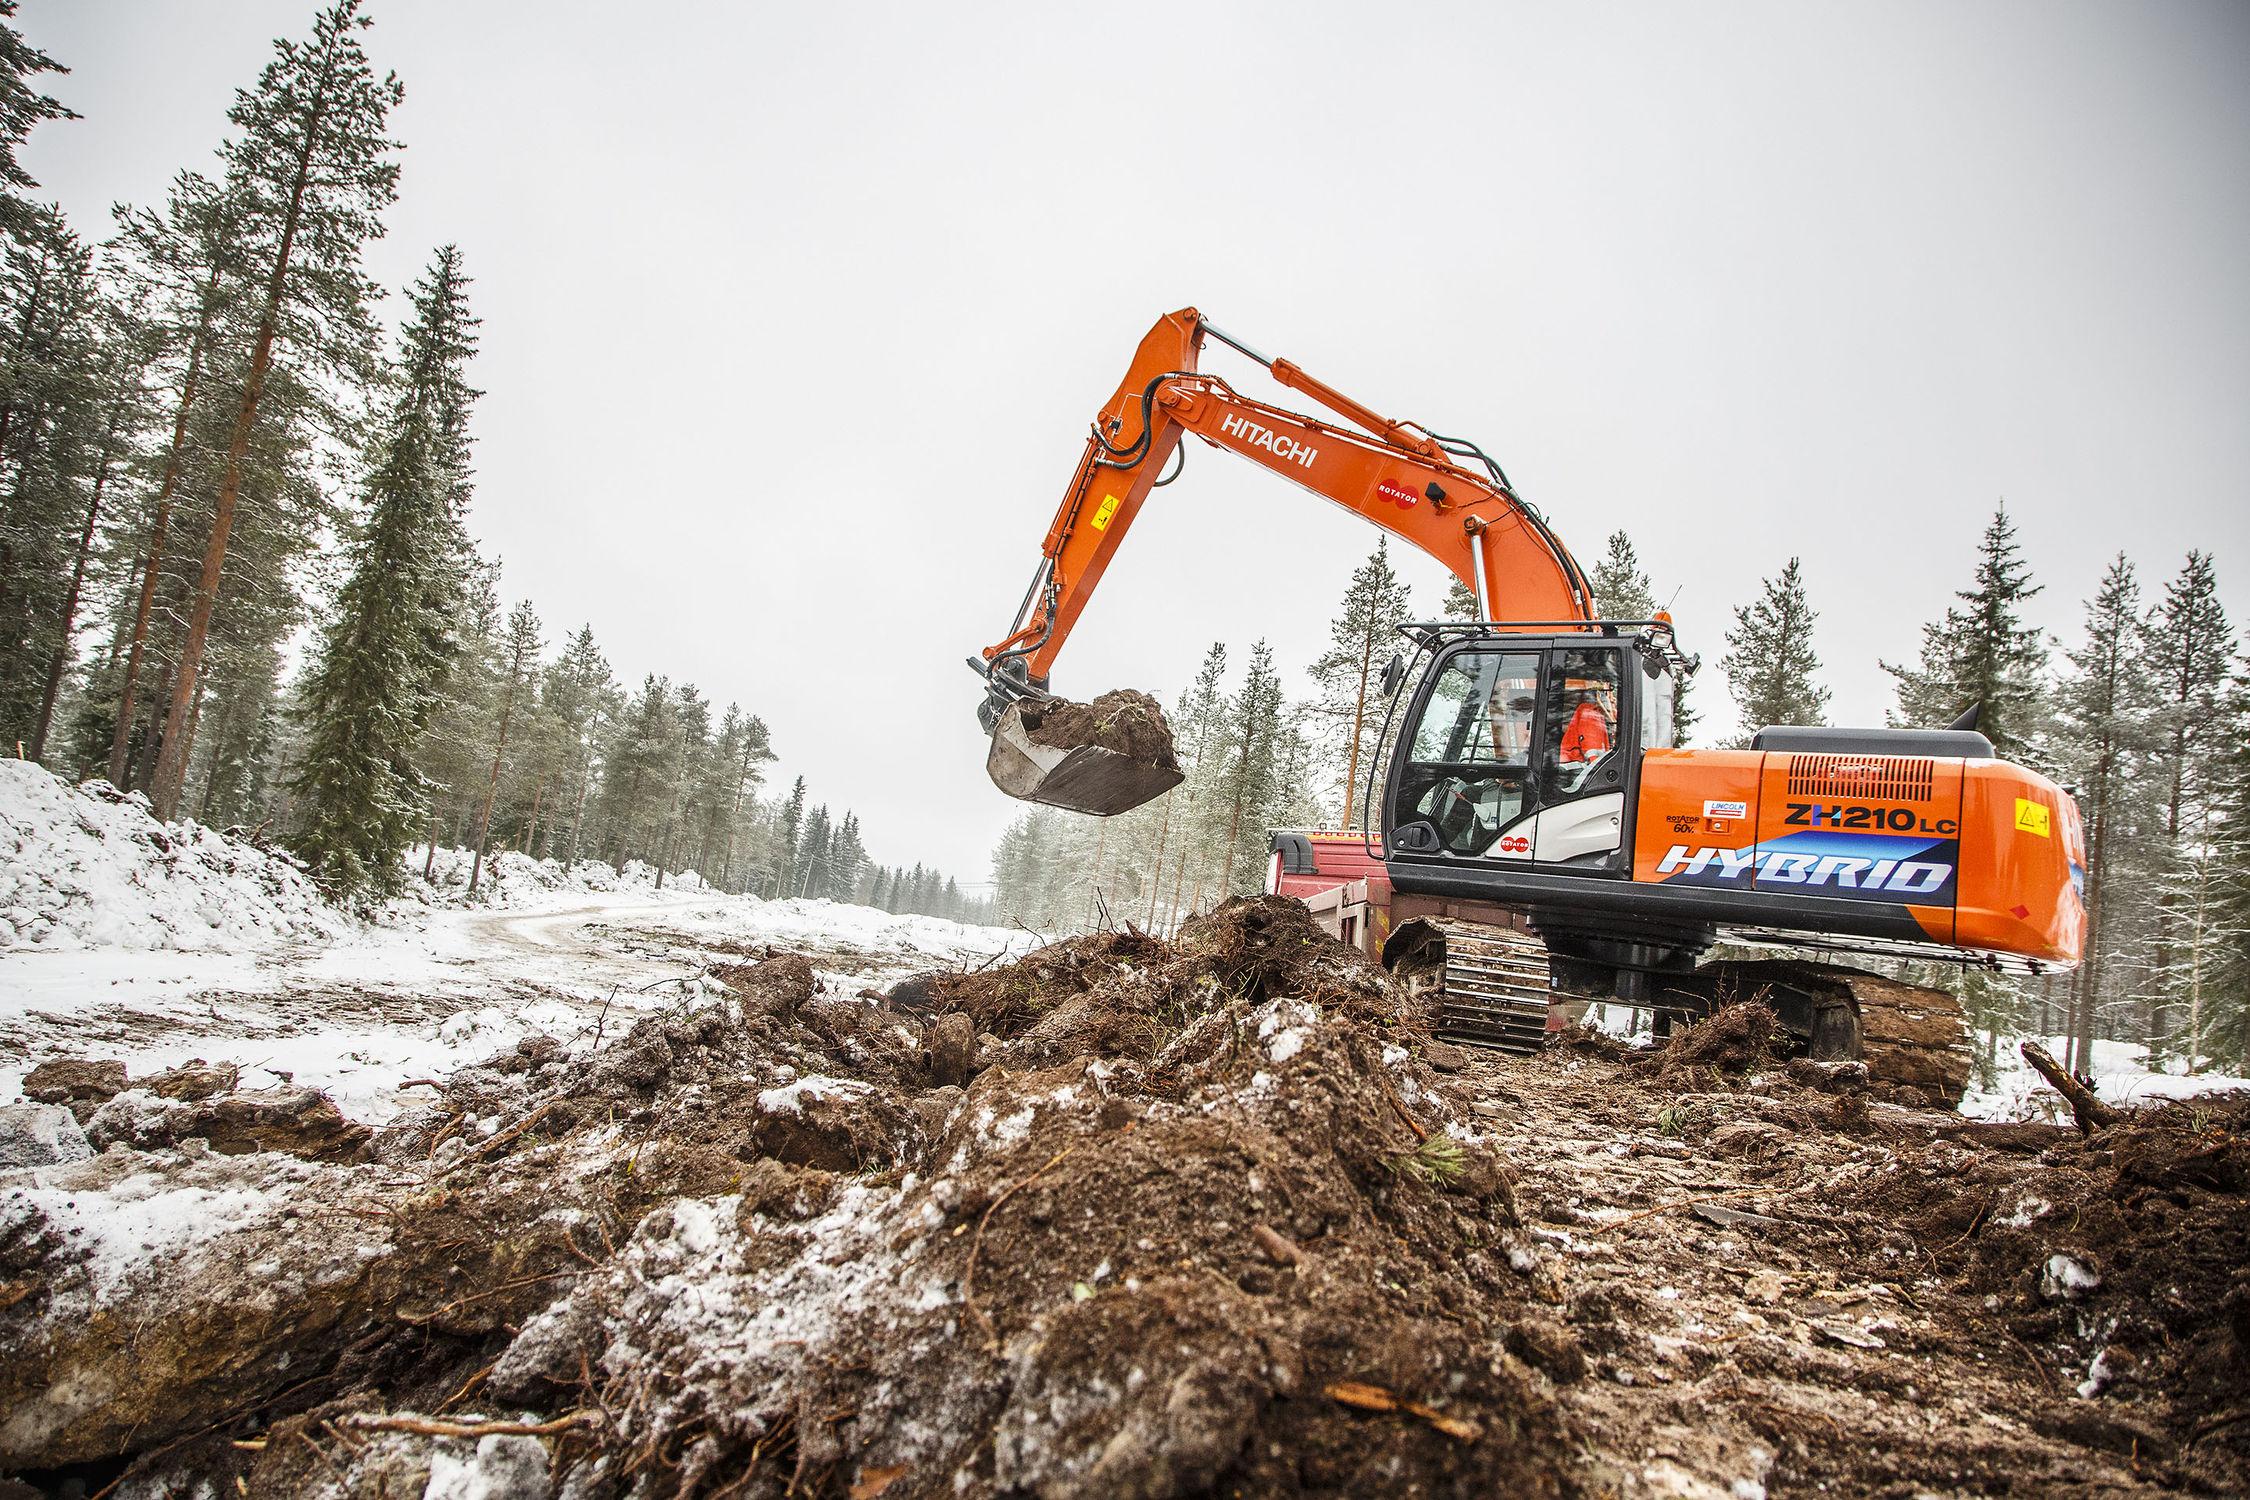 crawler-hybrid-excavators-21103-7102707